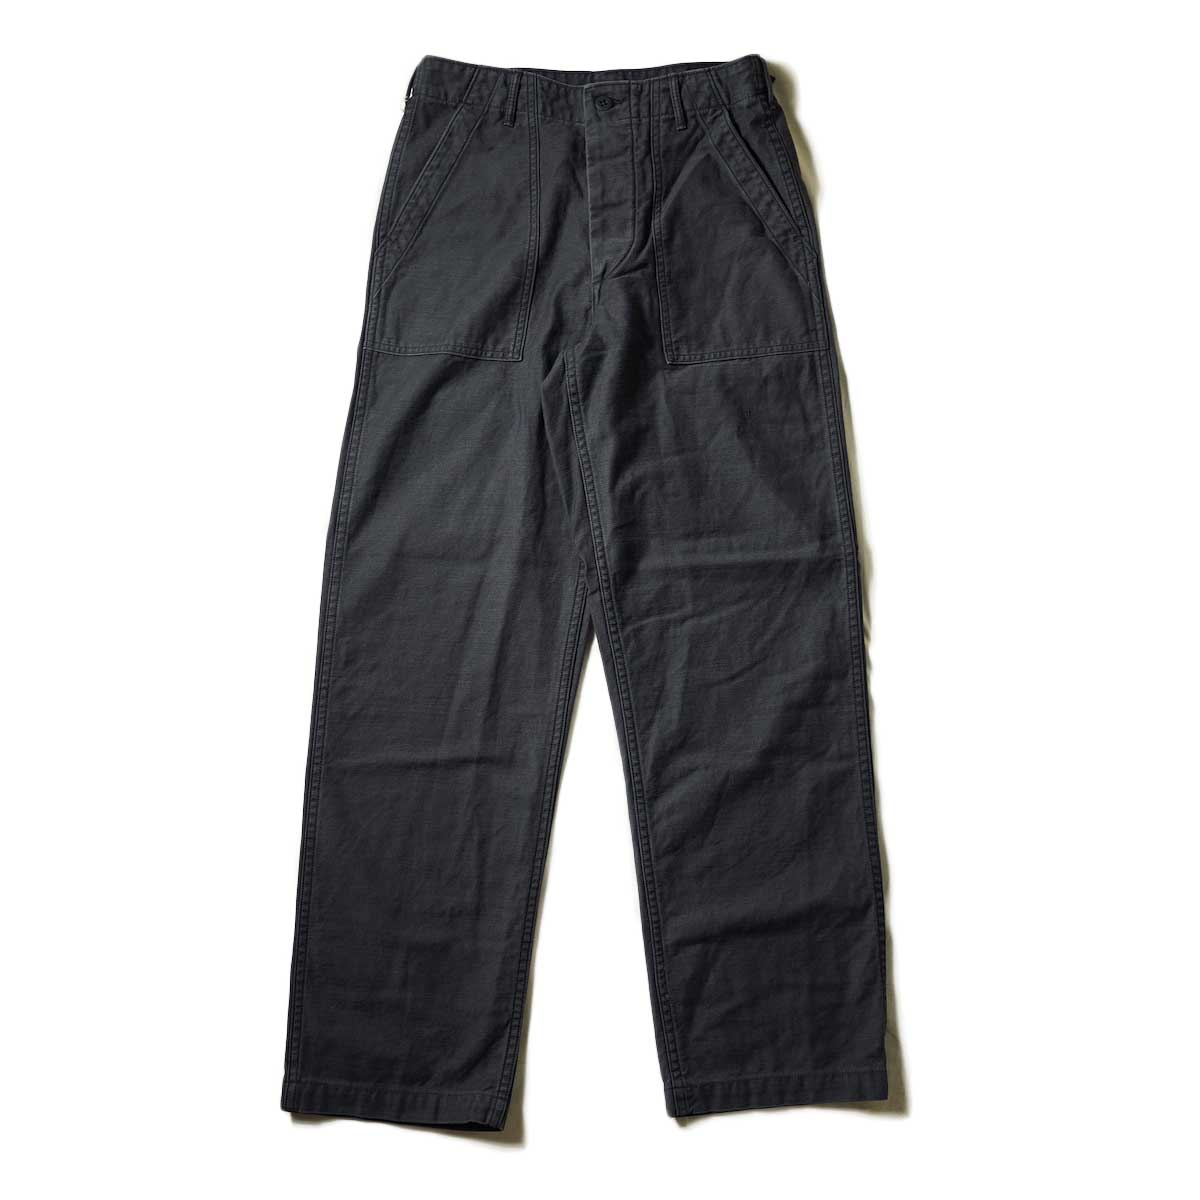 orSlow / US ARMY FATIGUE PANTS (BLACK STONE)